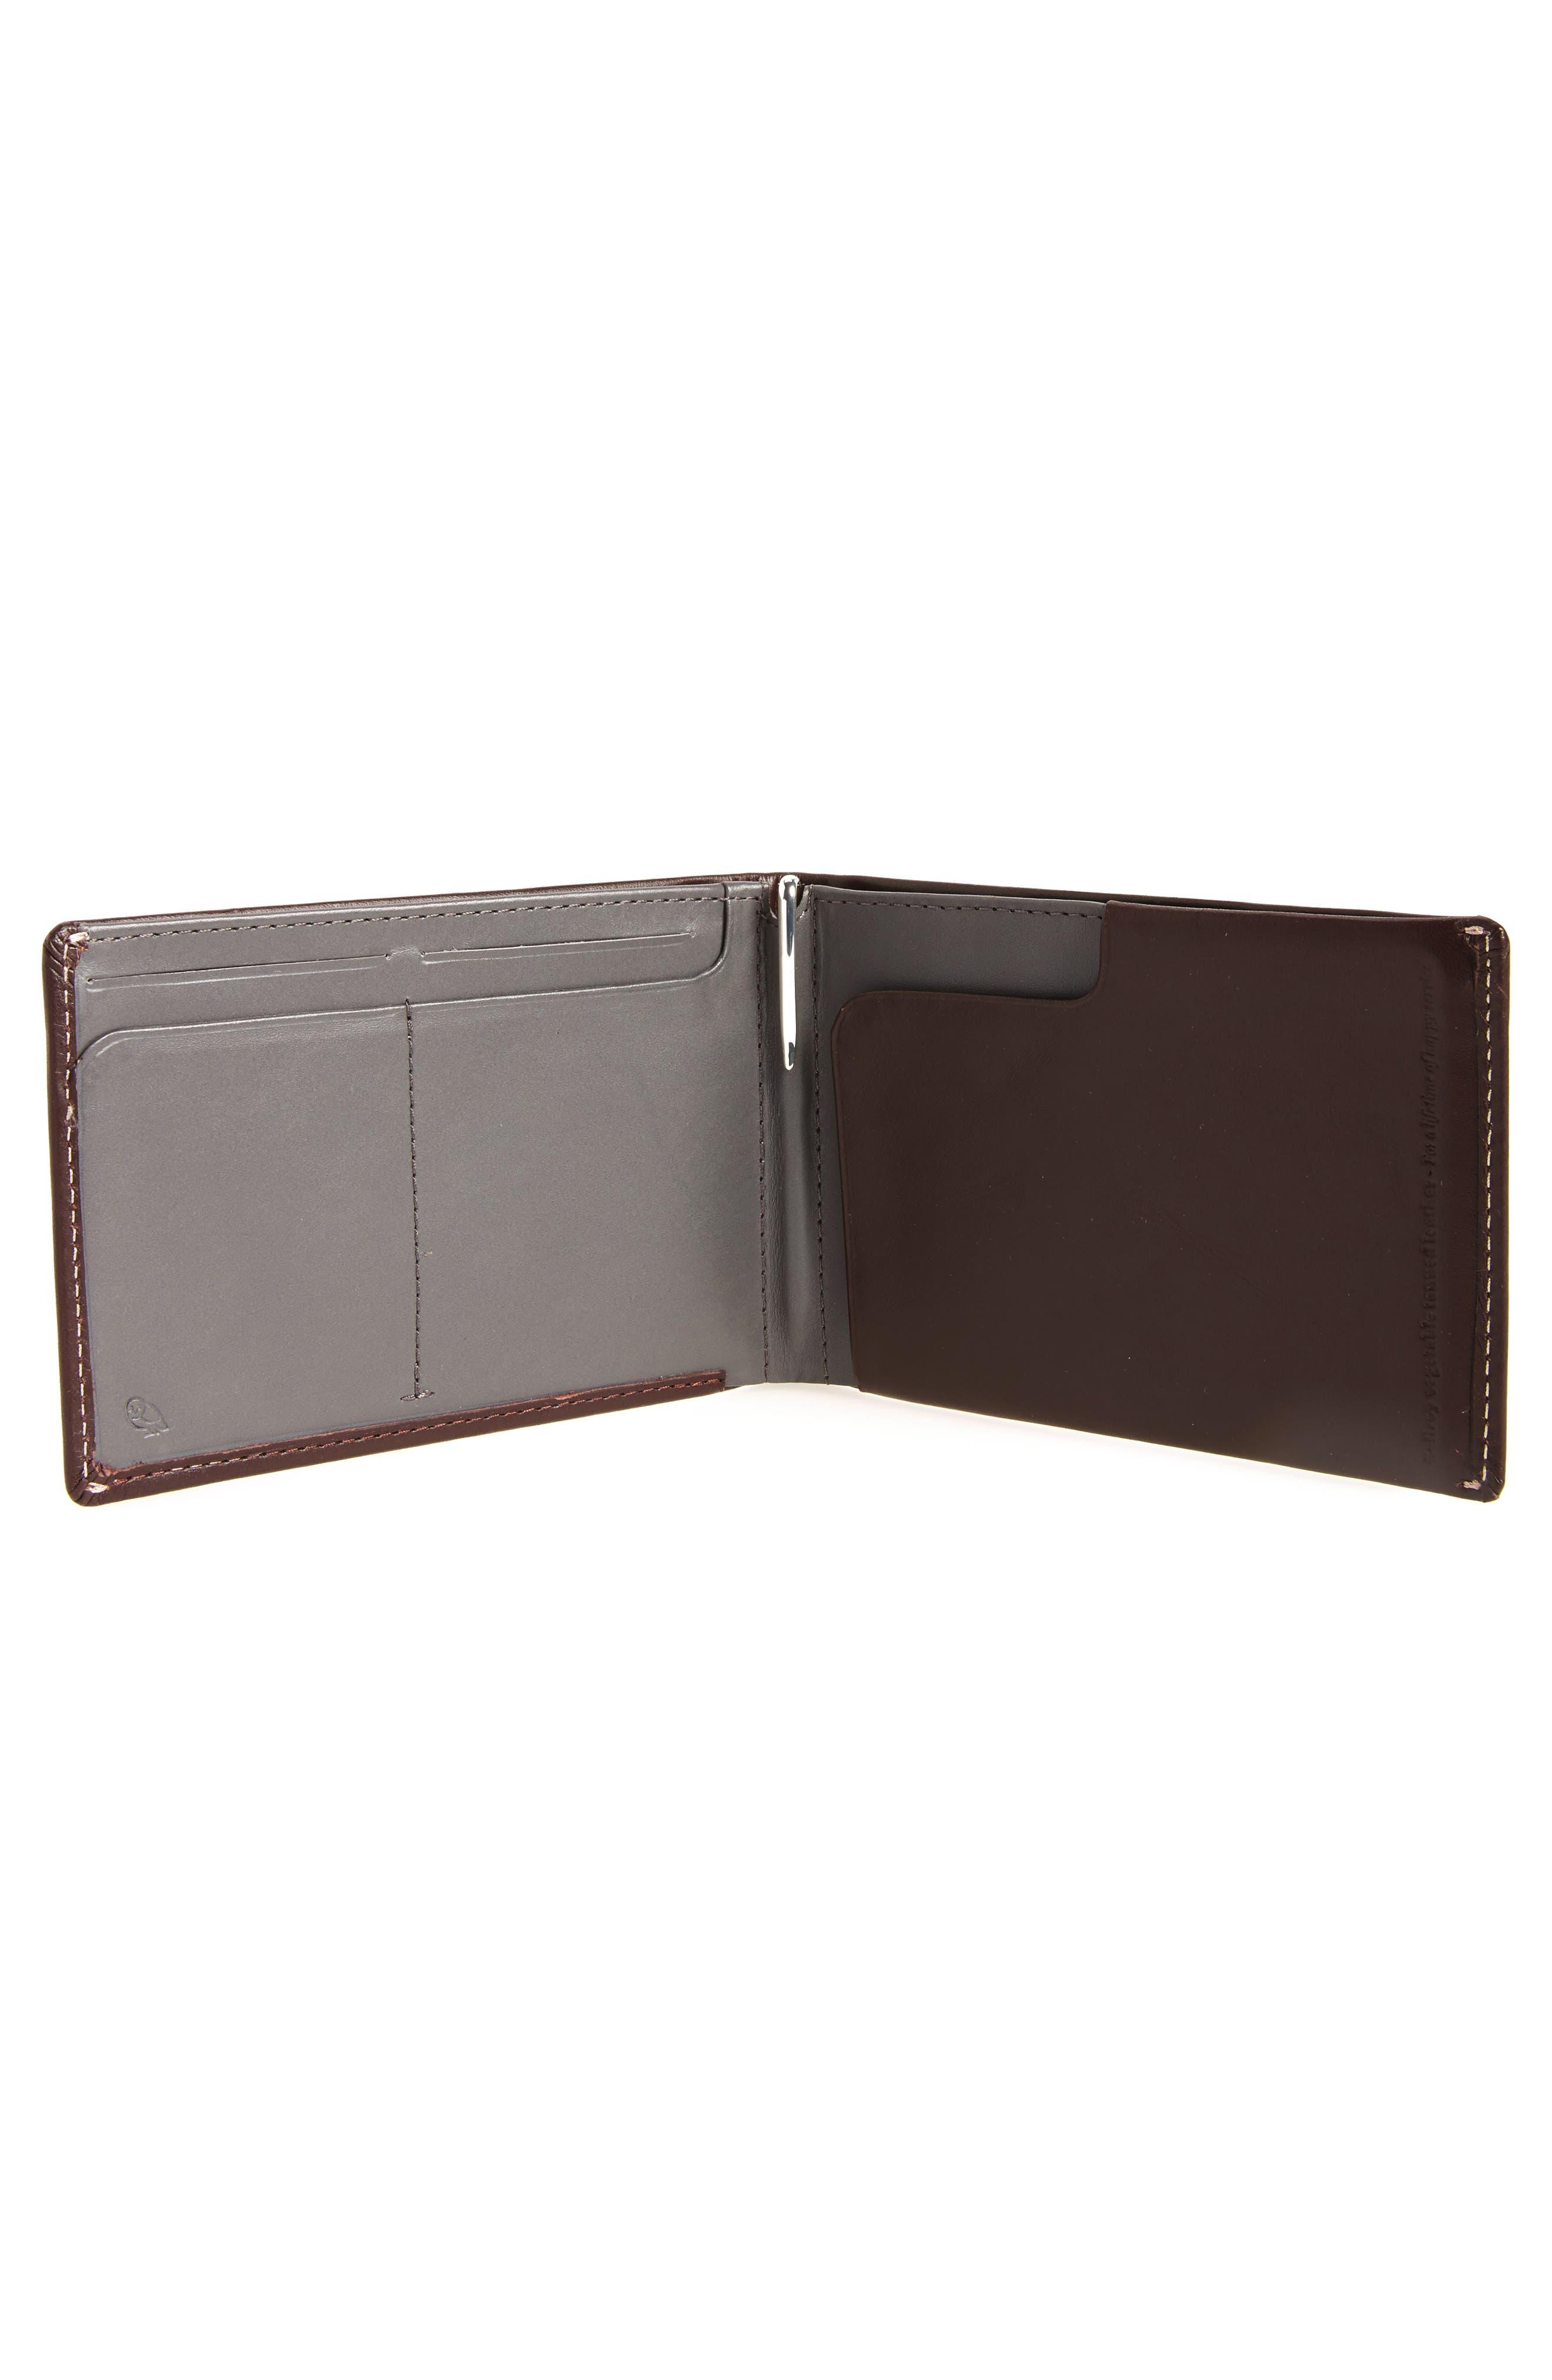 RFID Travel Wallet,                             Alternate thumbnail 2, color,                             Java